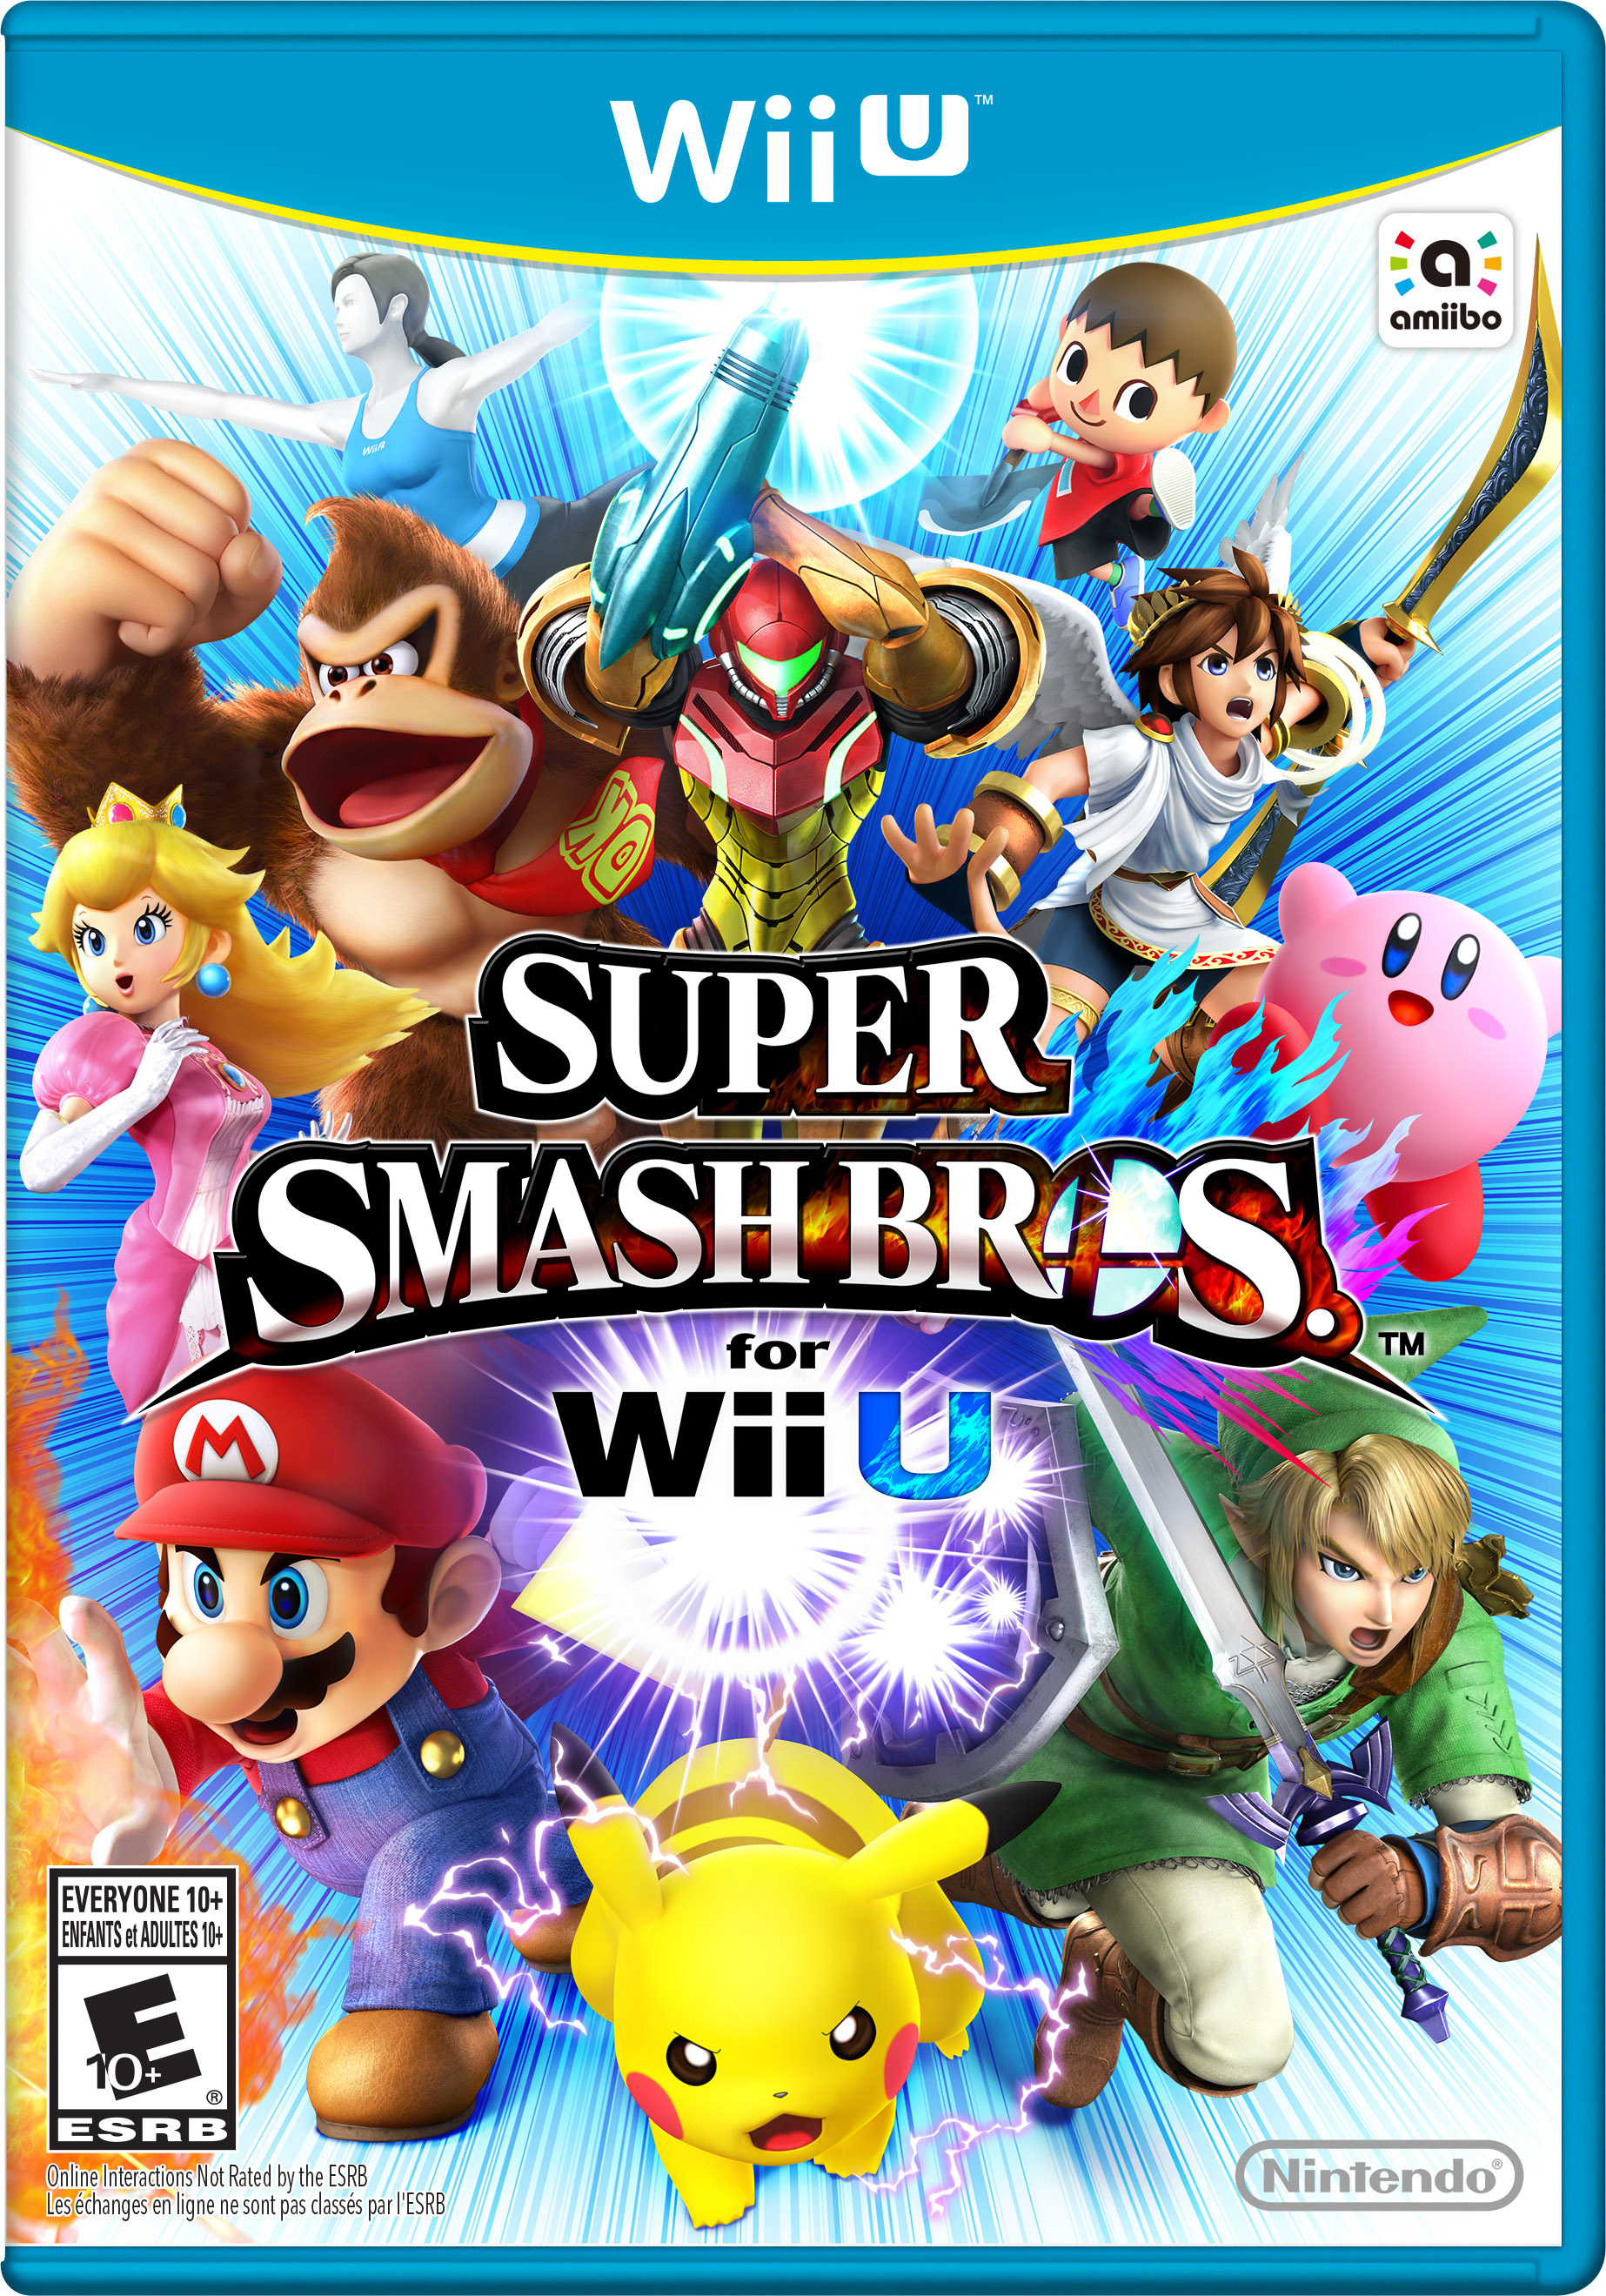 Super Smash Bros.: Release im Mai 2014?